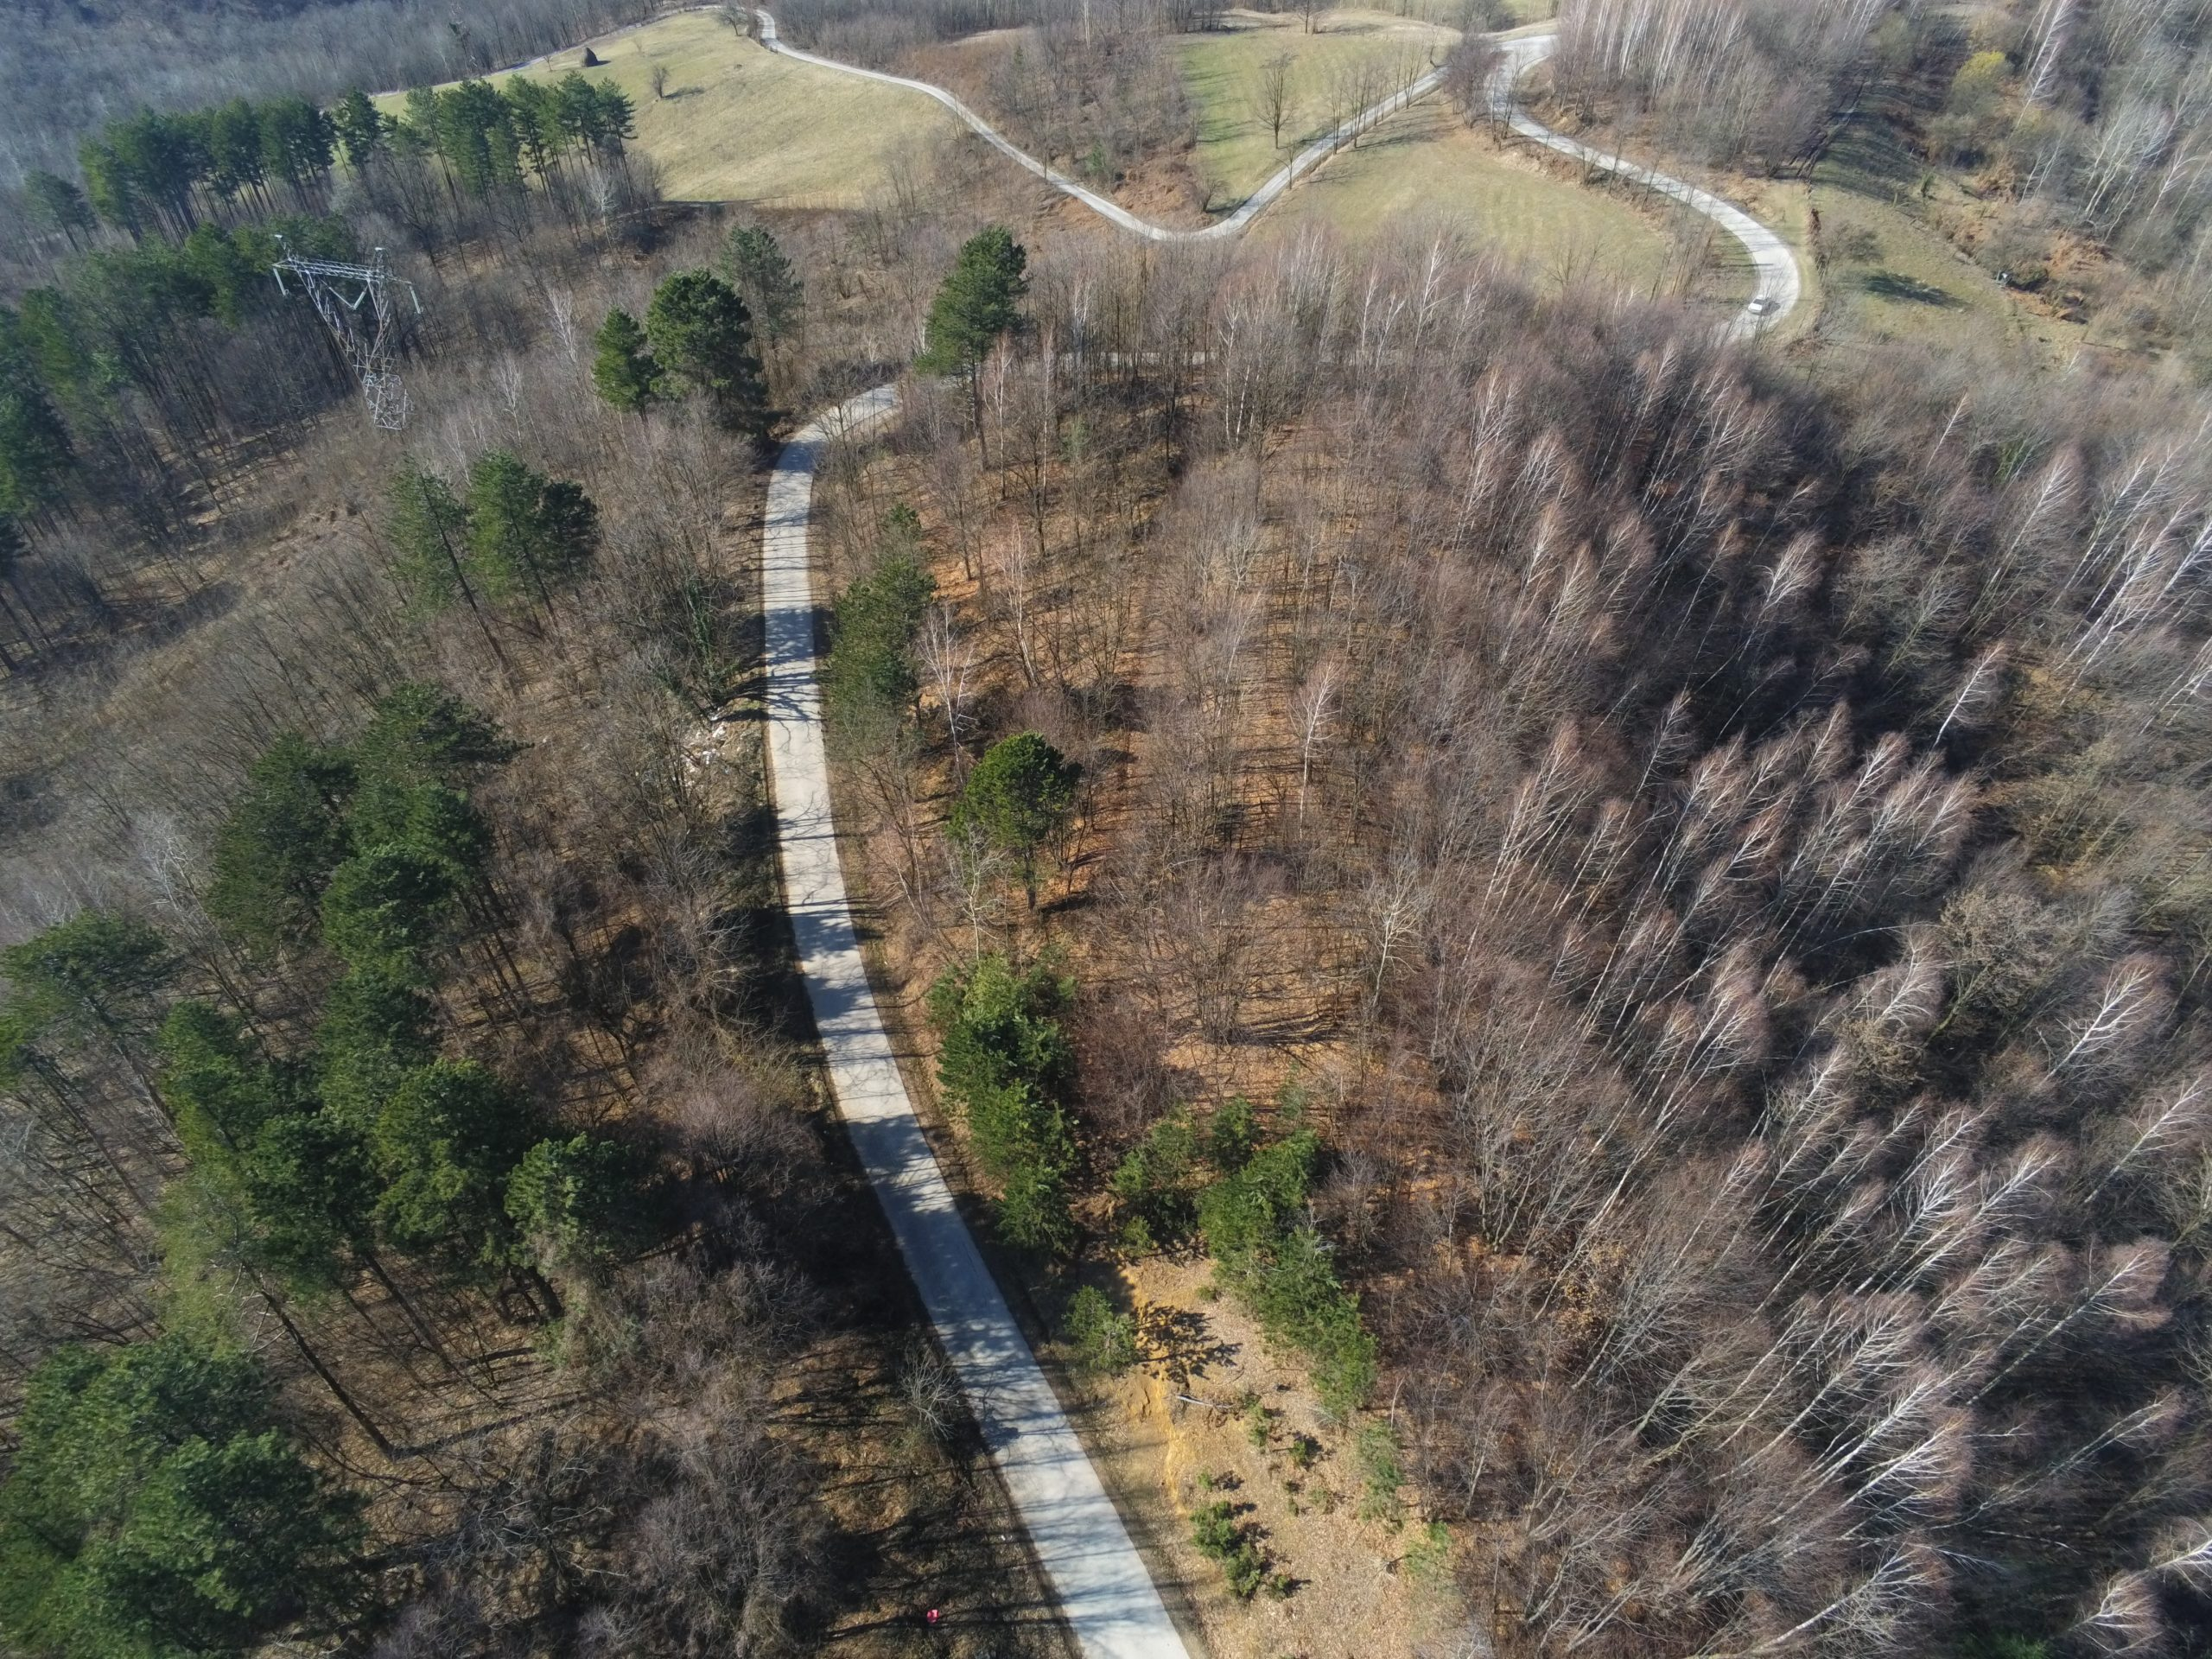 Hodzici Road 3 - Drone